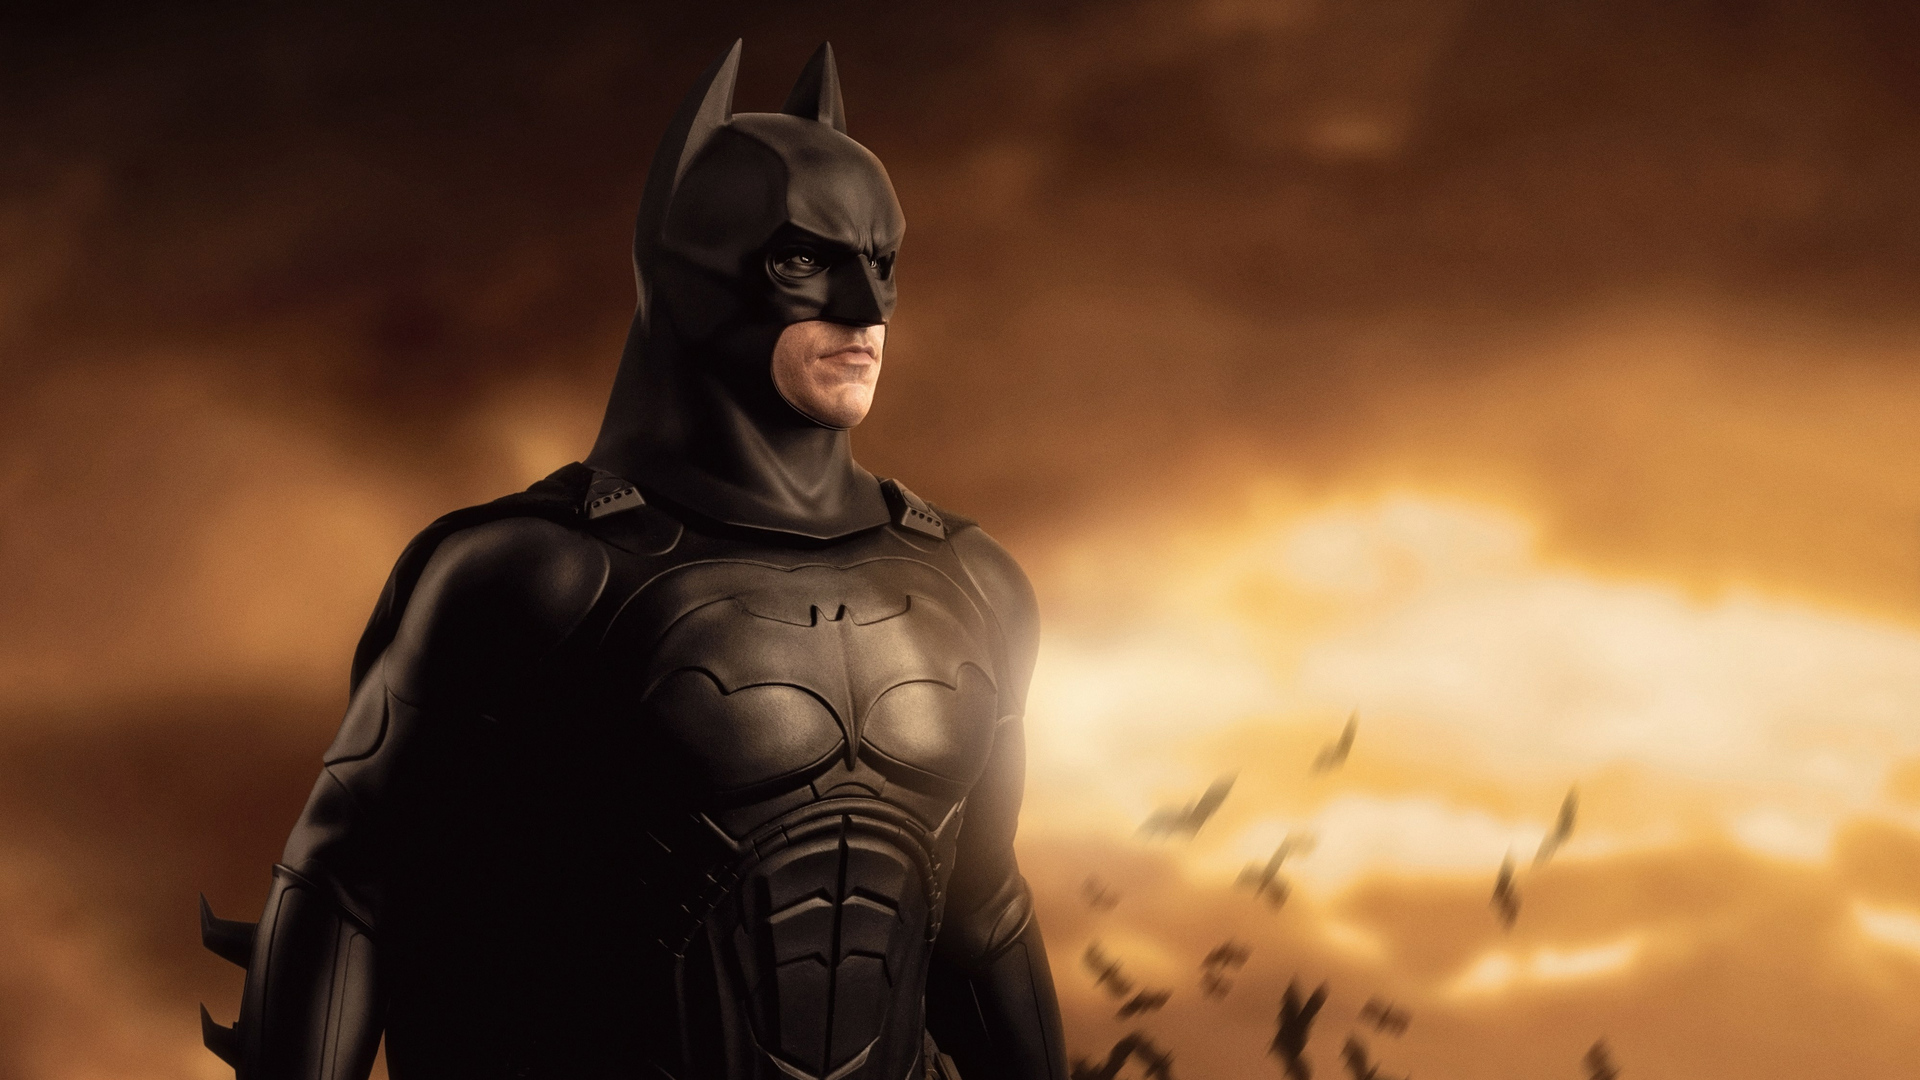 1920x1080 Batman Arkham 4k Laptop Full HD 1080P HD 4k ...